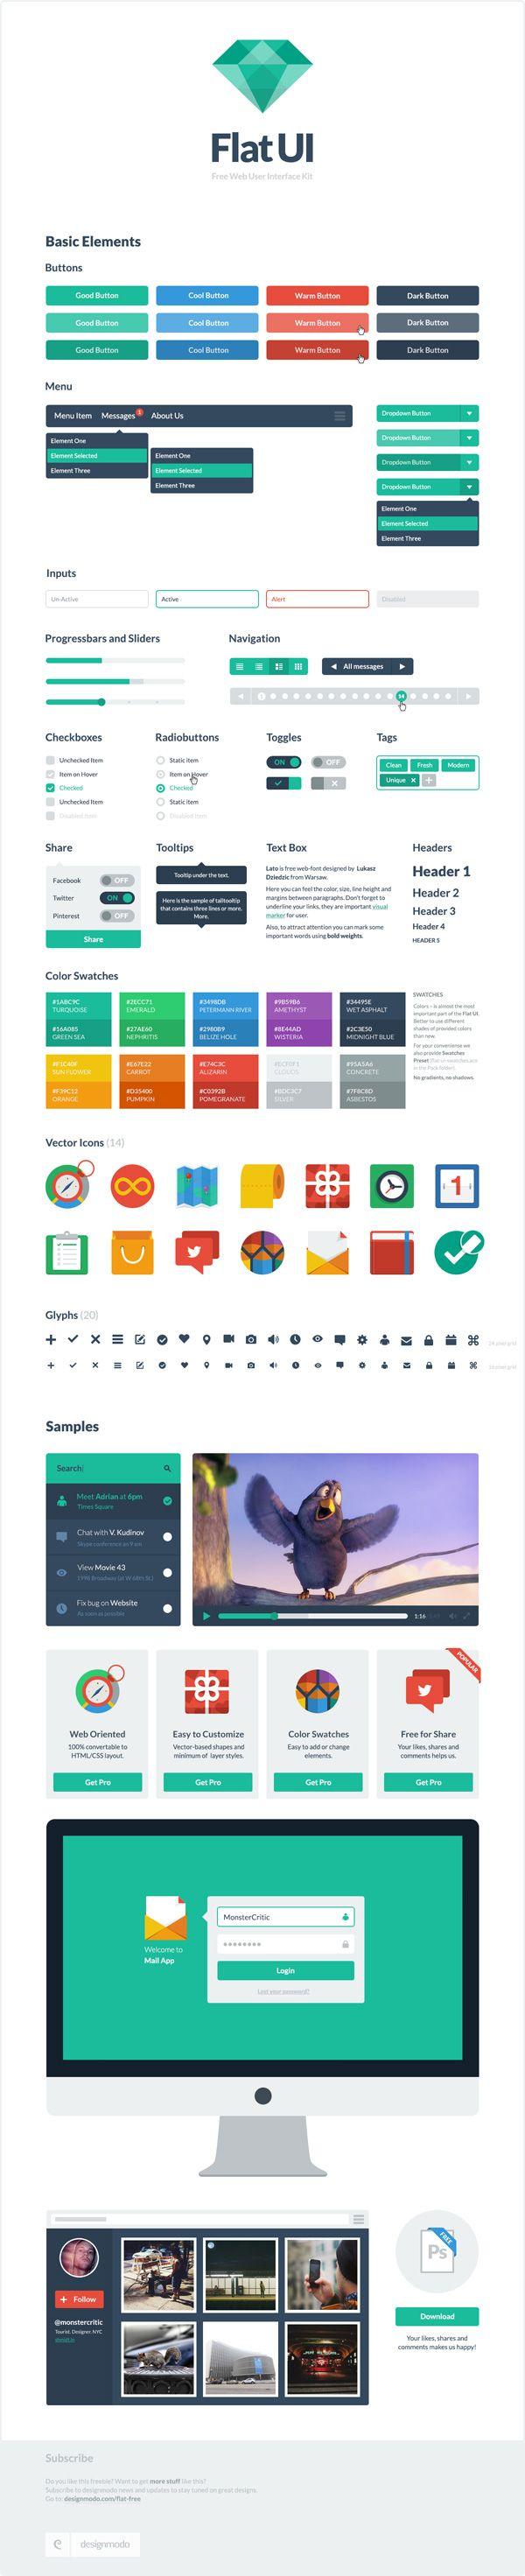 Flat UI Free – PSD User Interface Kit    Source: http://designmodo.com/flat-free/#ixzz2OFvNu700